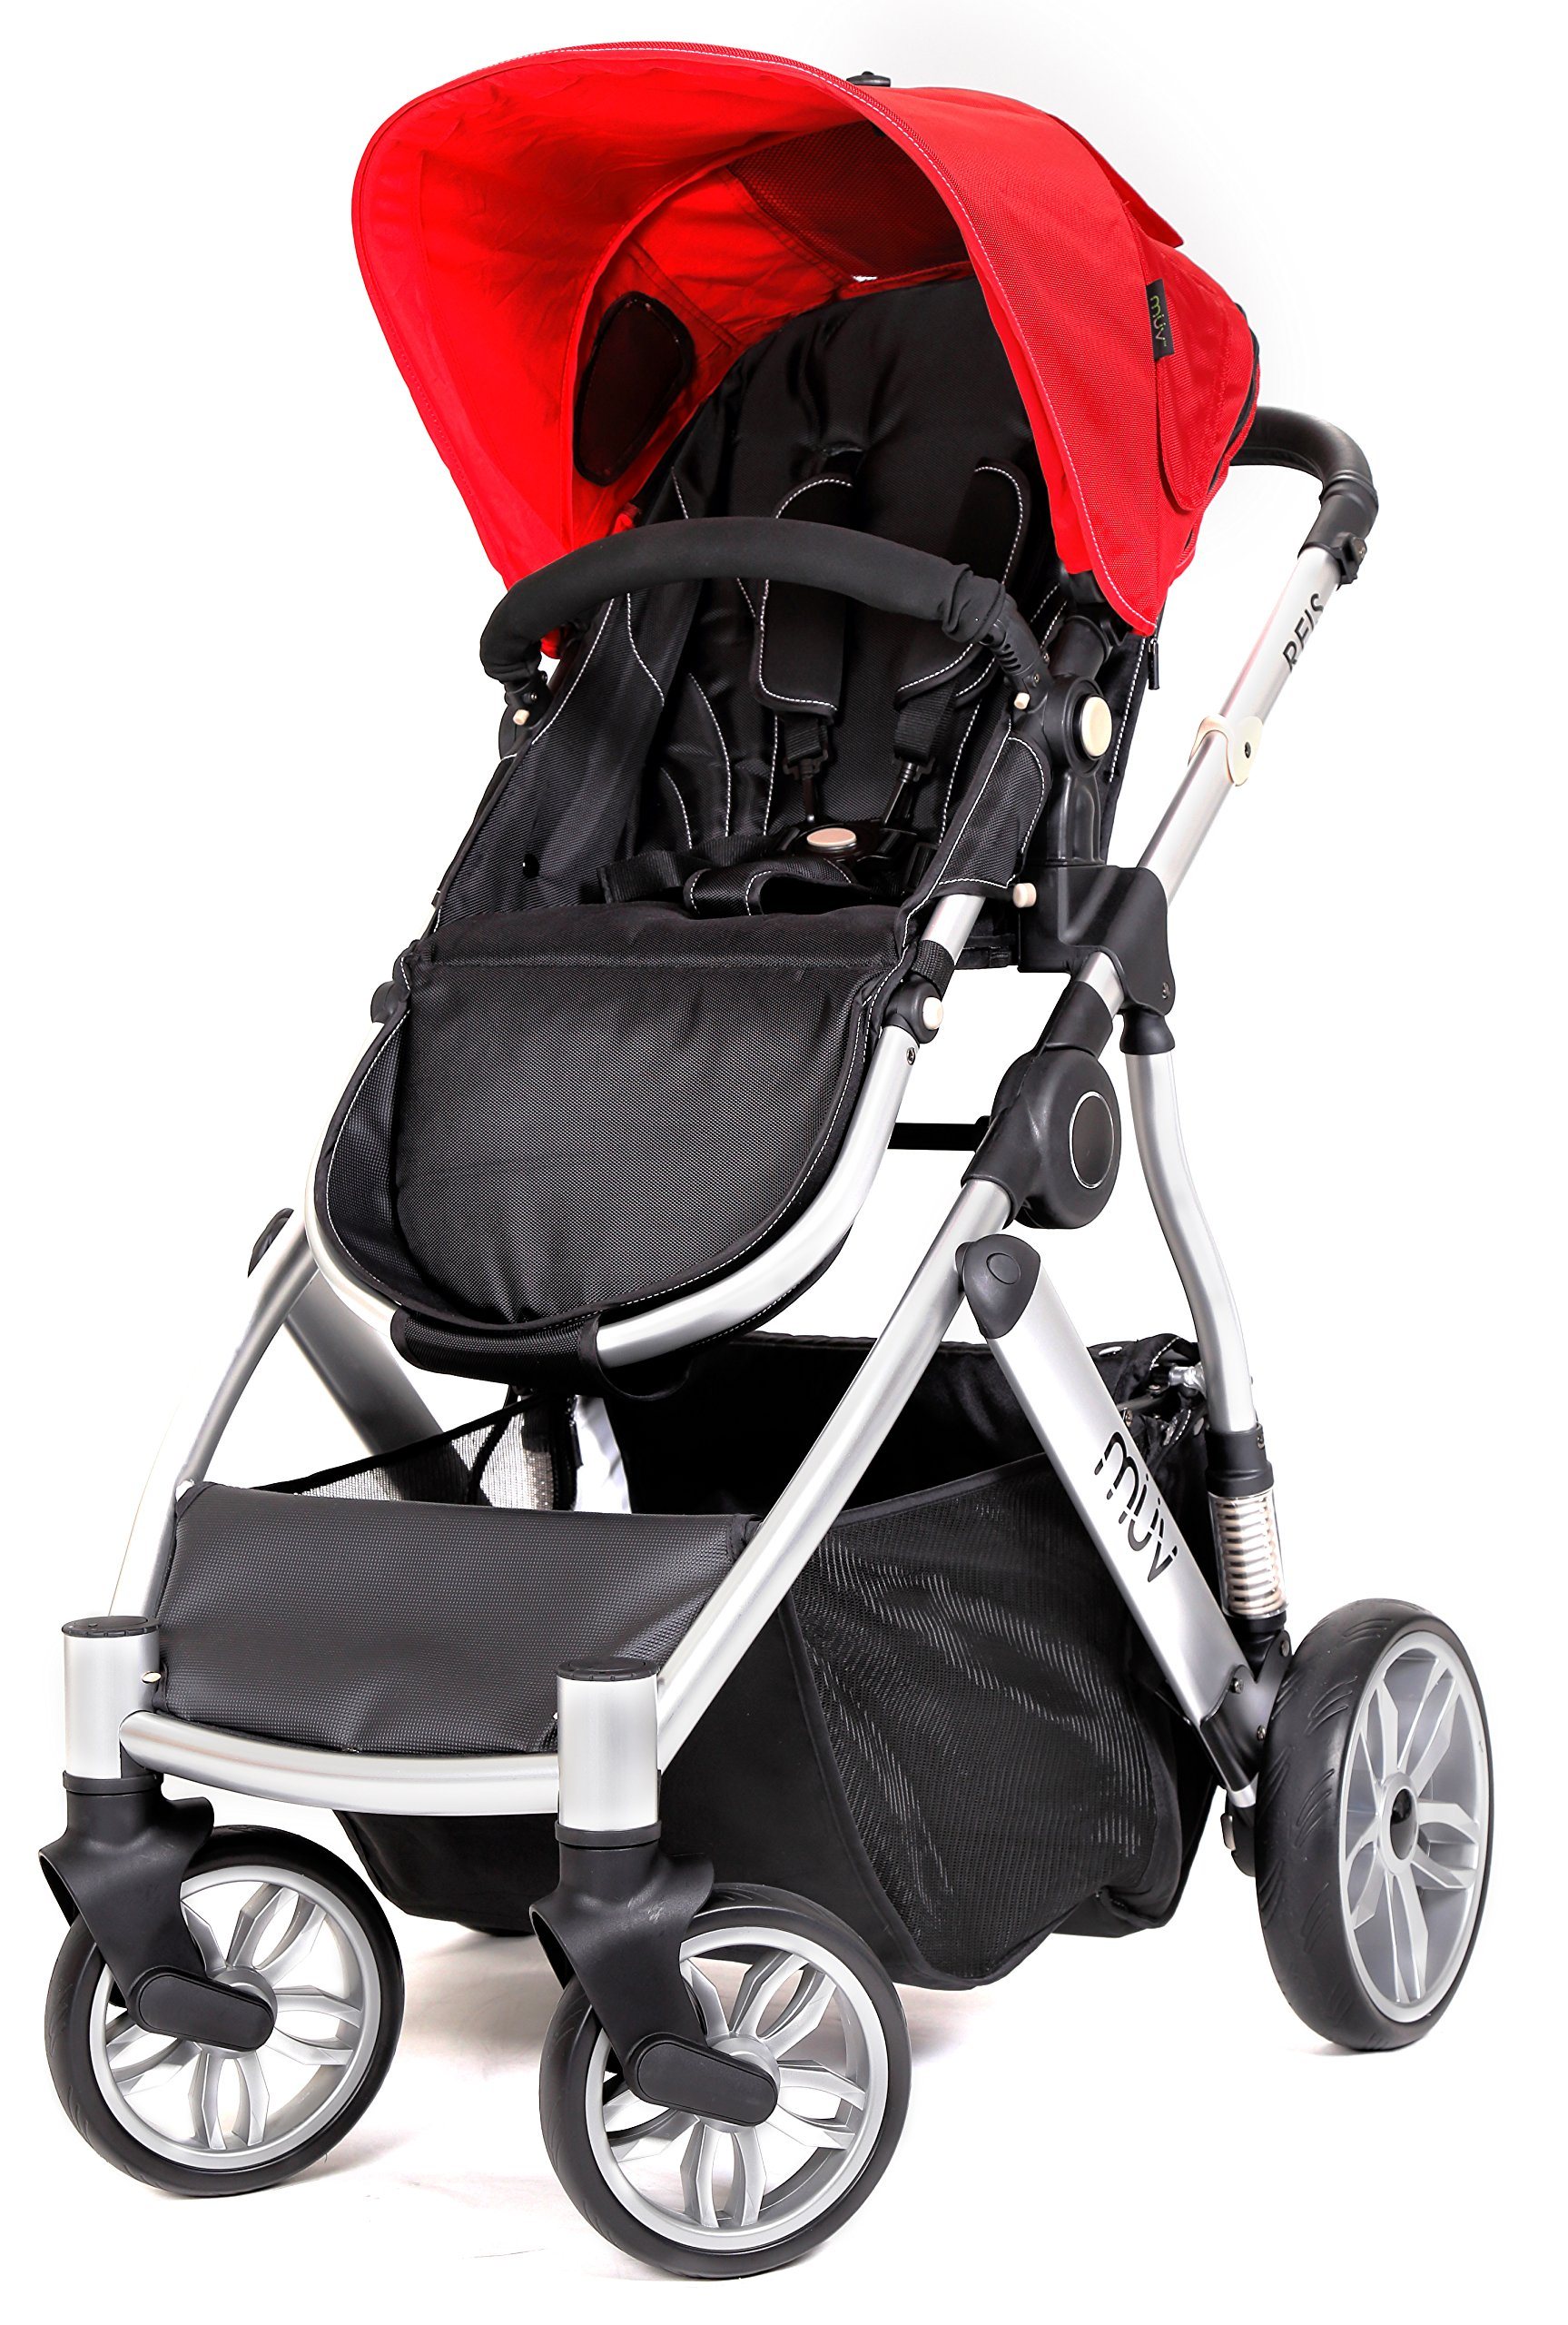 Muv Baby Trend Reis Stroller, Artic Silver/Cabernet